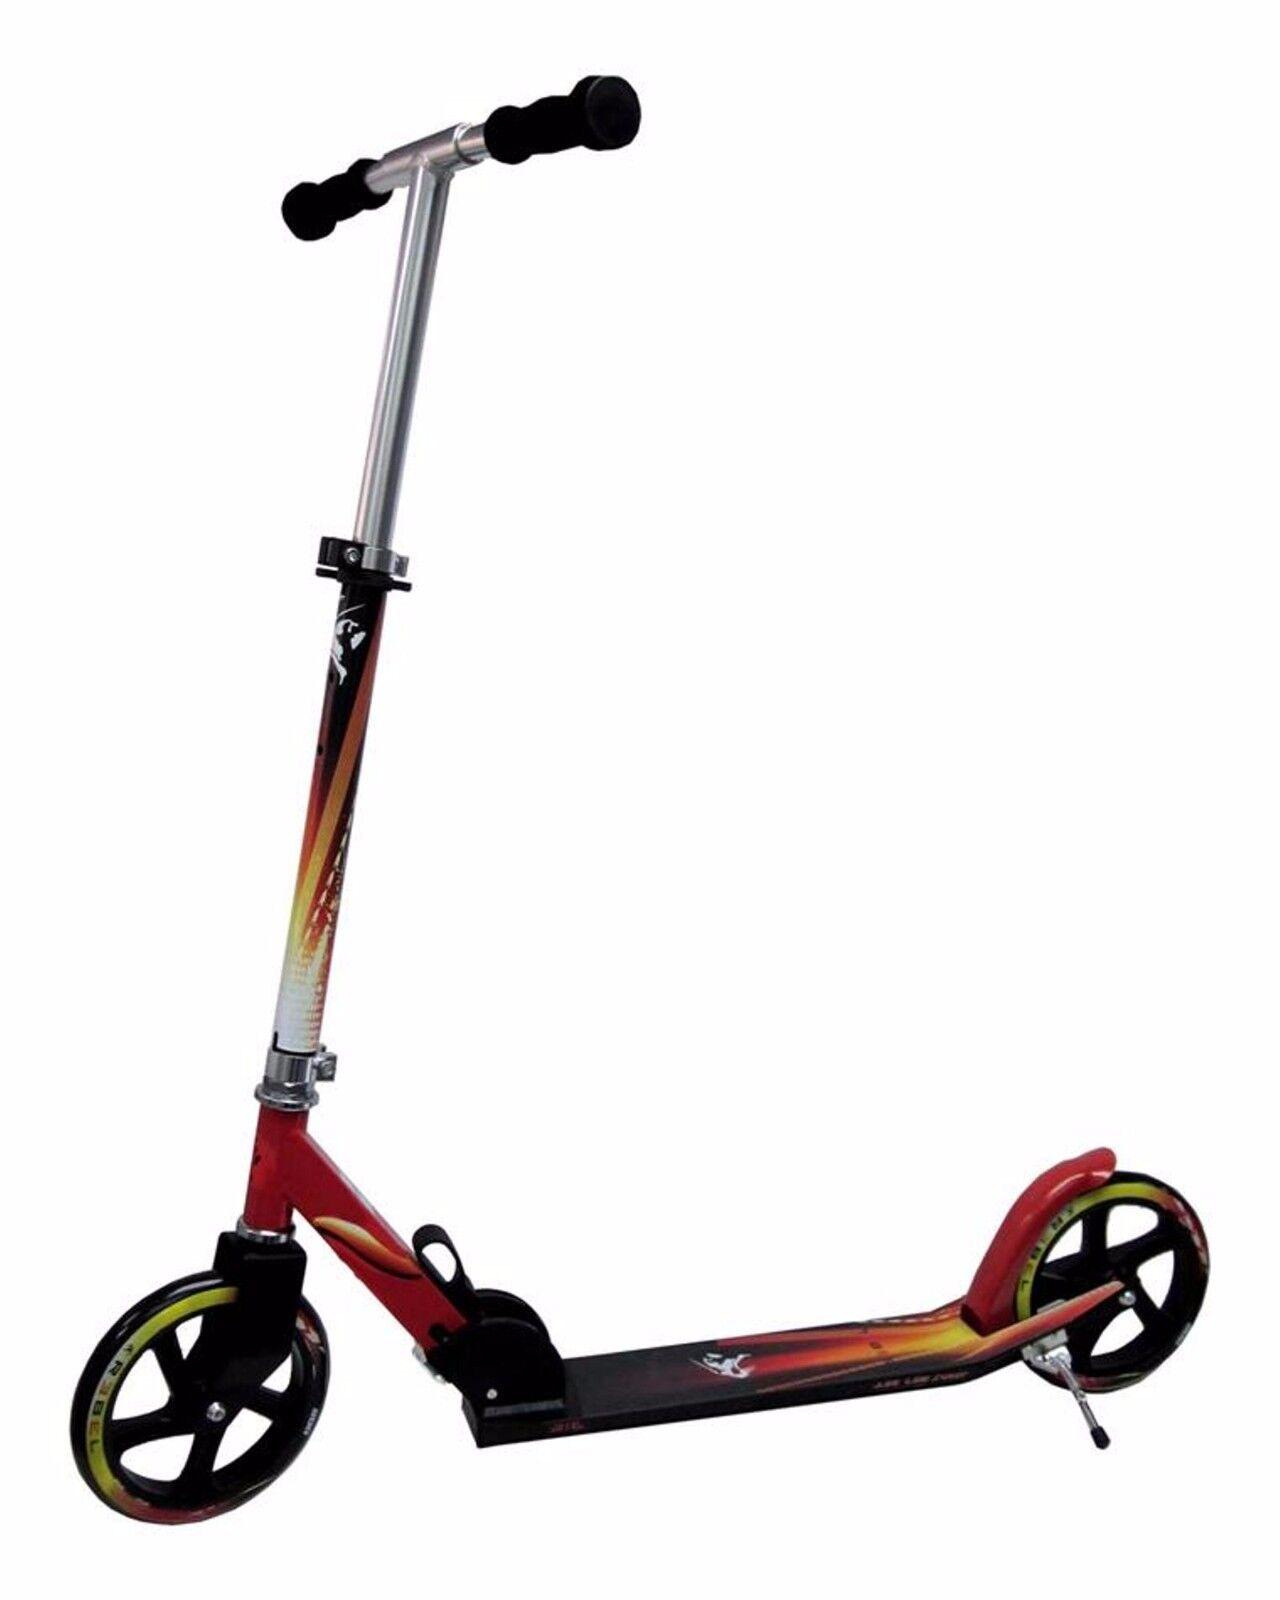 Scooter Roller Big  205mm REBEL Low Rider Cityroller Kickboard